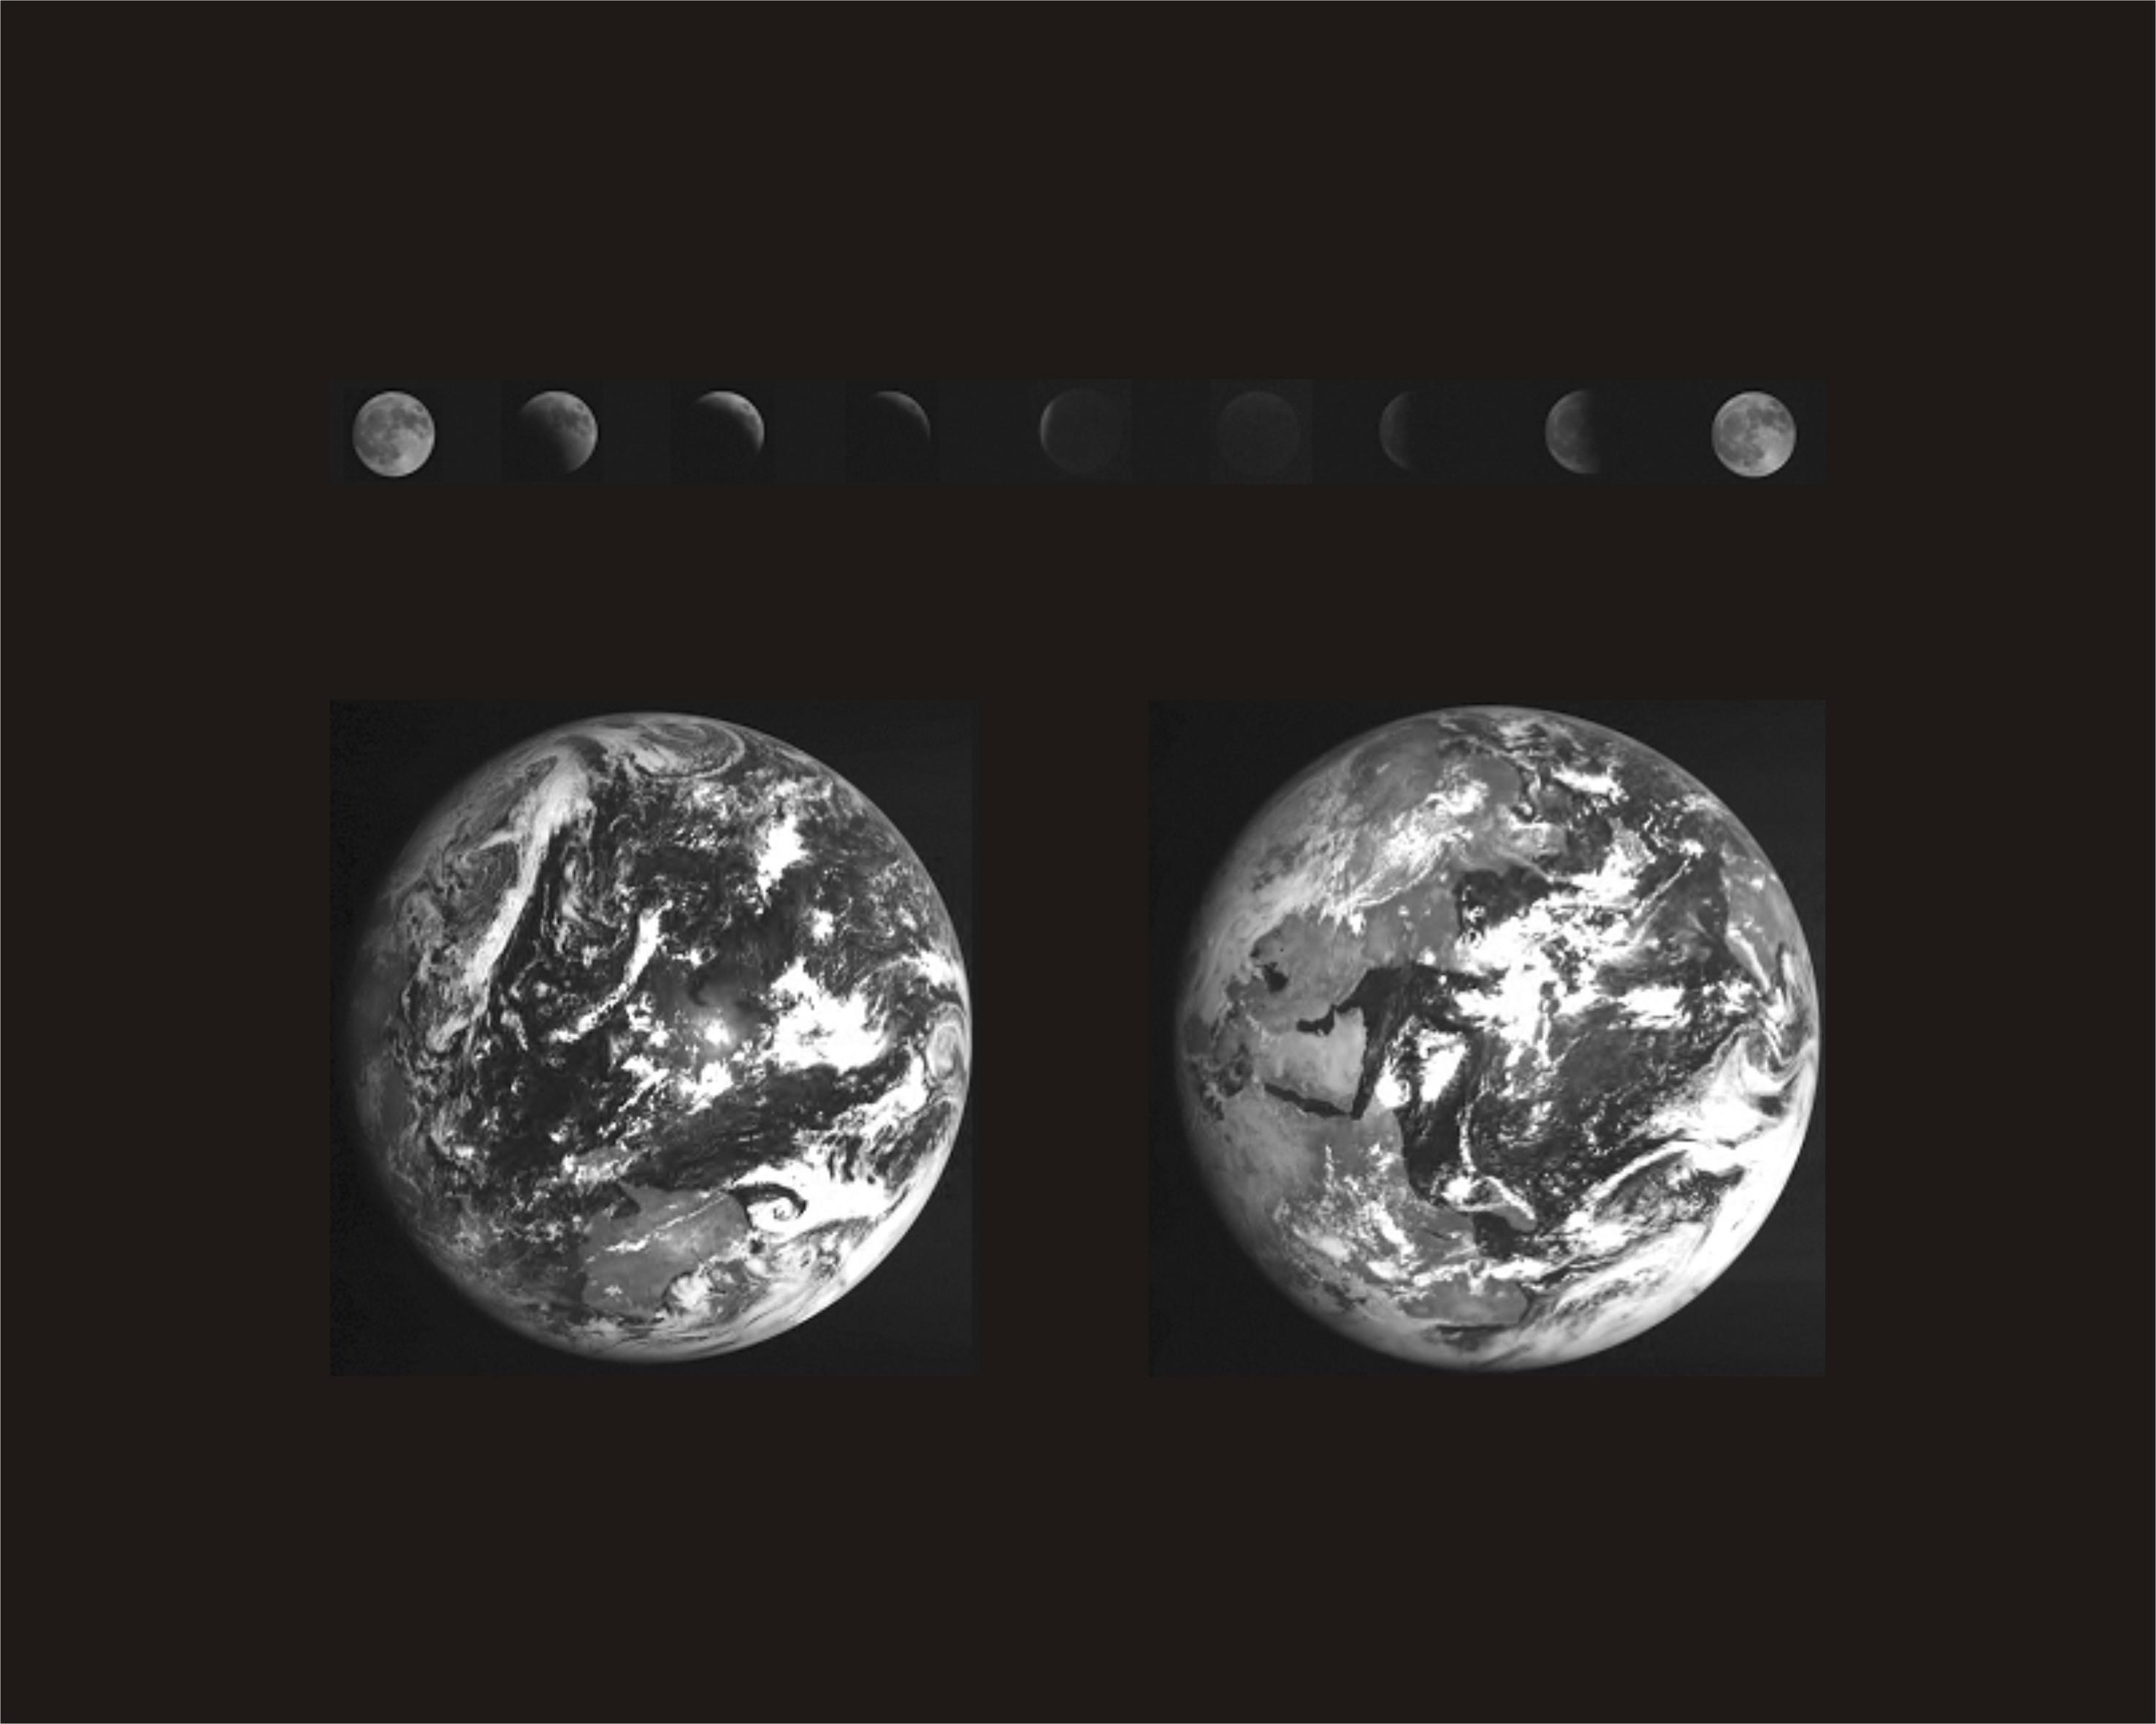 1567218819487-smart-1_lunar-eclipse_family-portrait.JPG